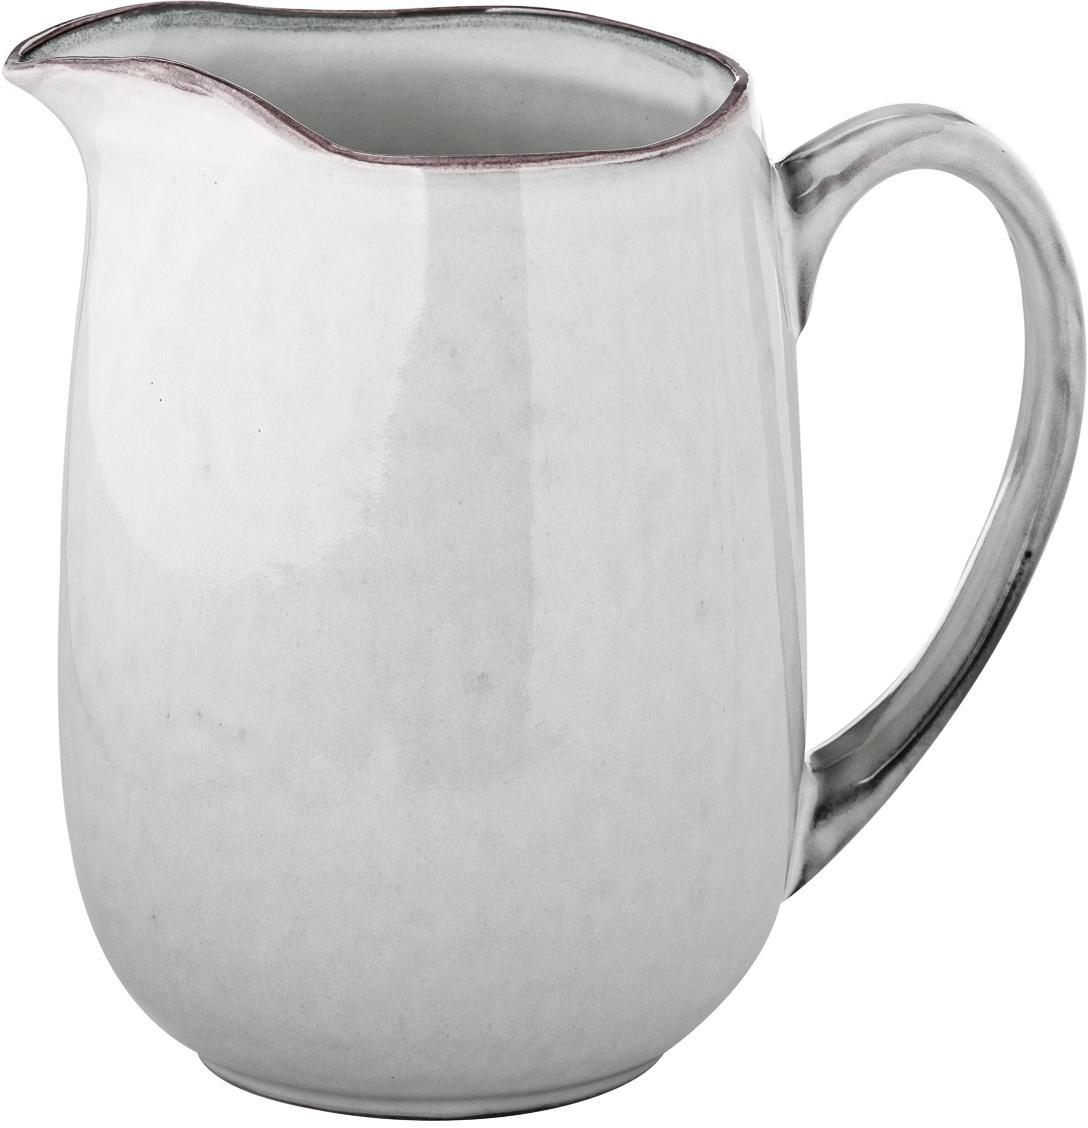 Brocca da latte fatta a mano Nordic Sand, Terracotta, Sabbia, Larg. 17 x Alt. 16 cm